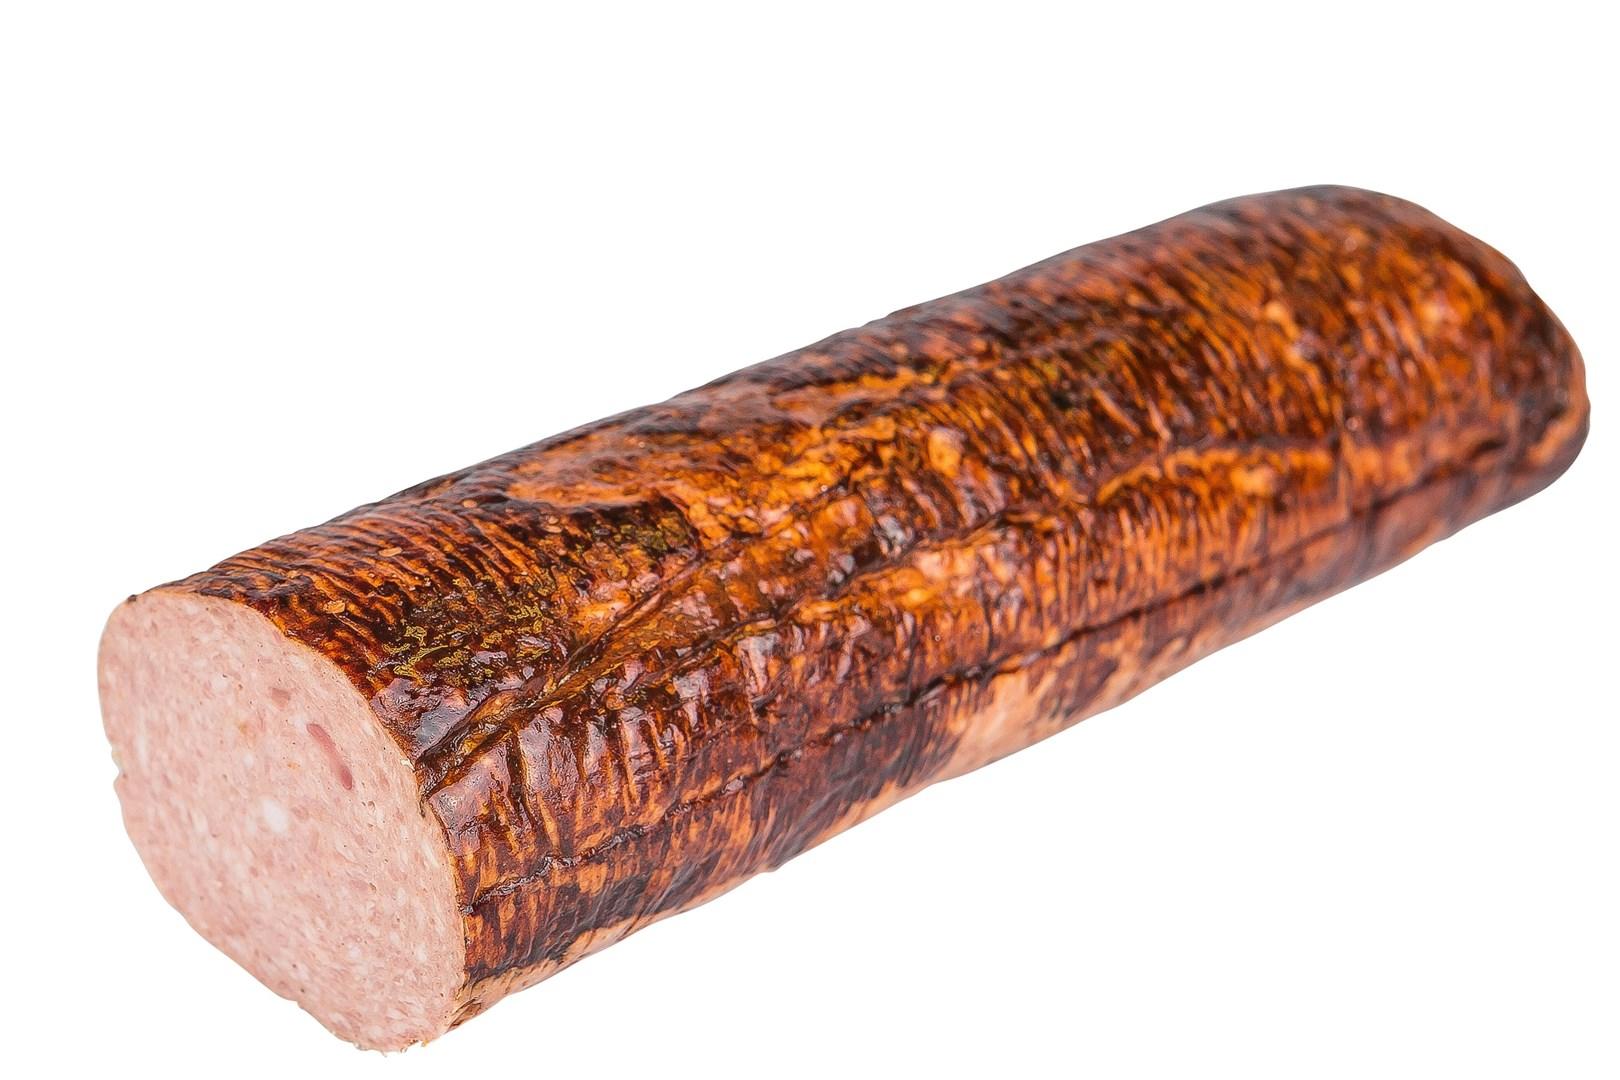 Productafbeelding Grillworst naturel broodje